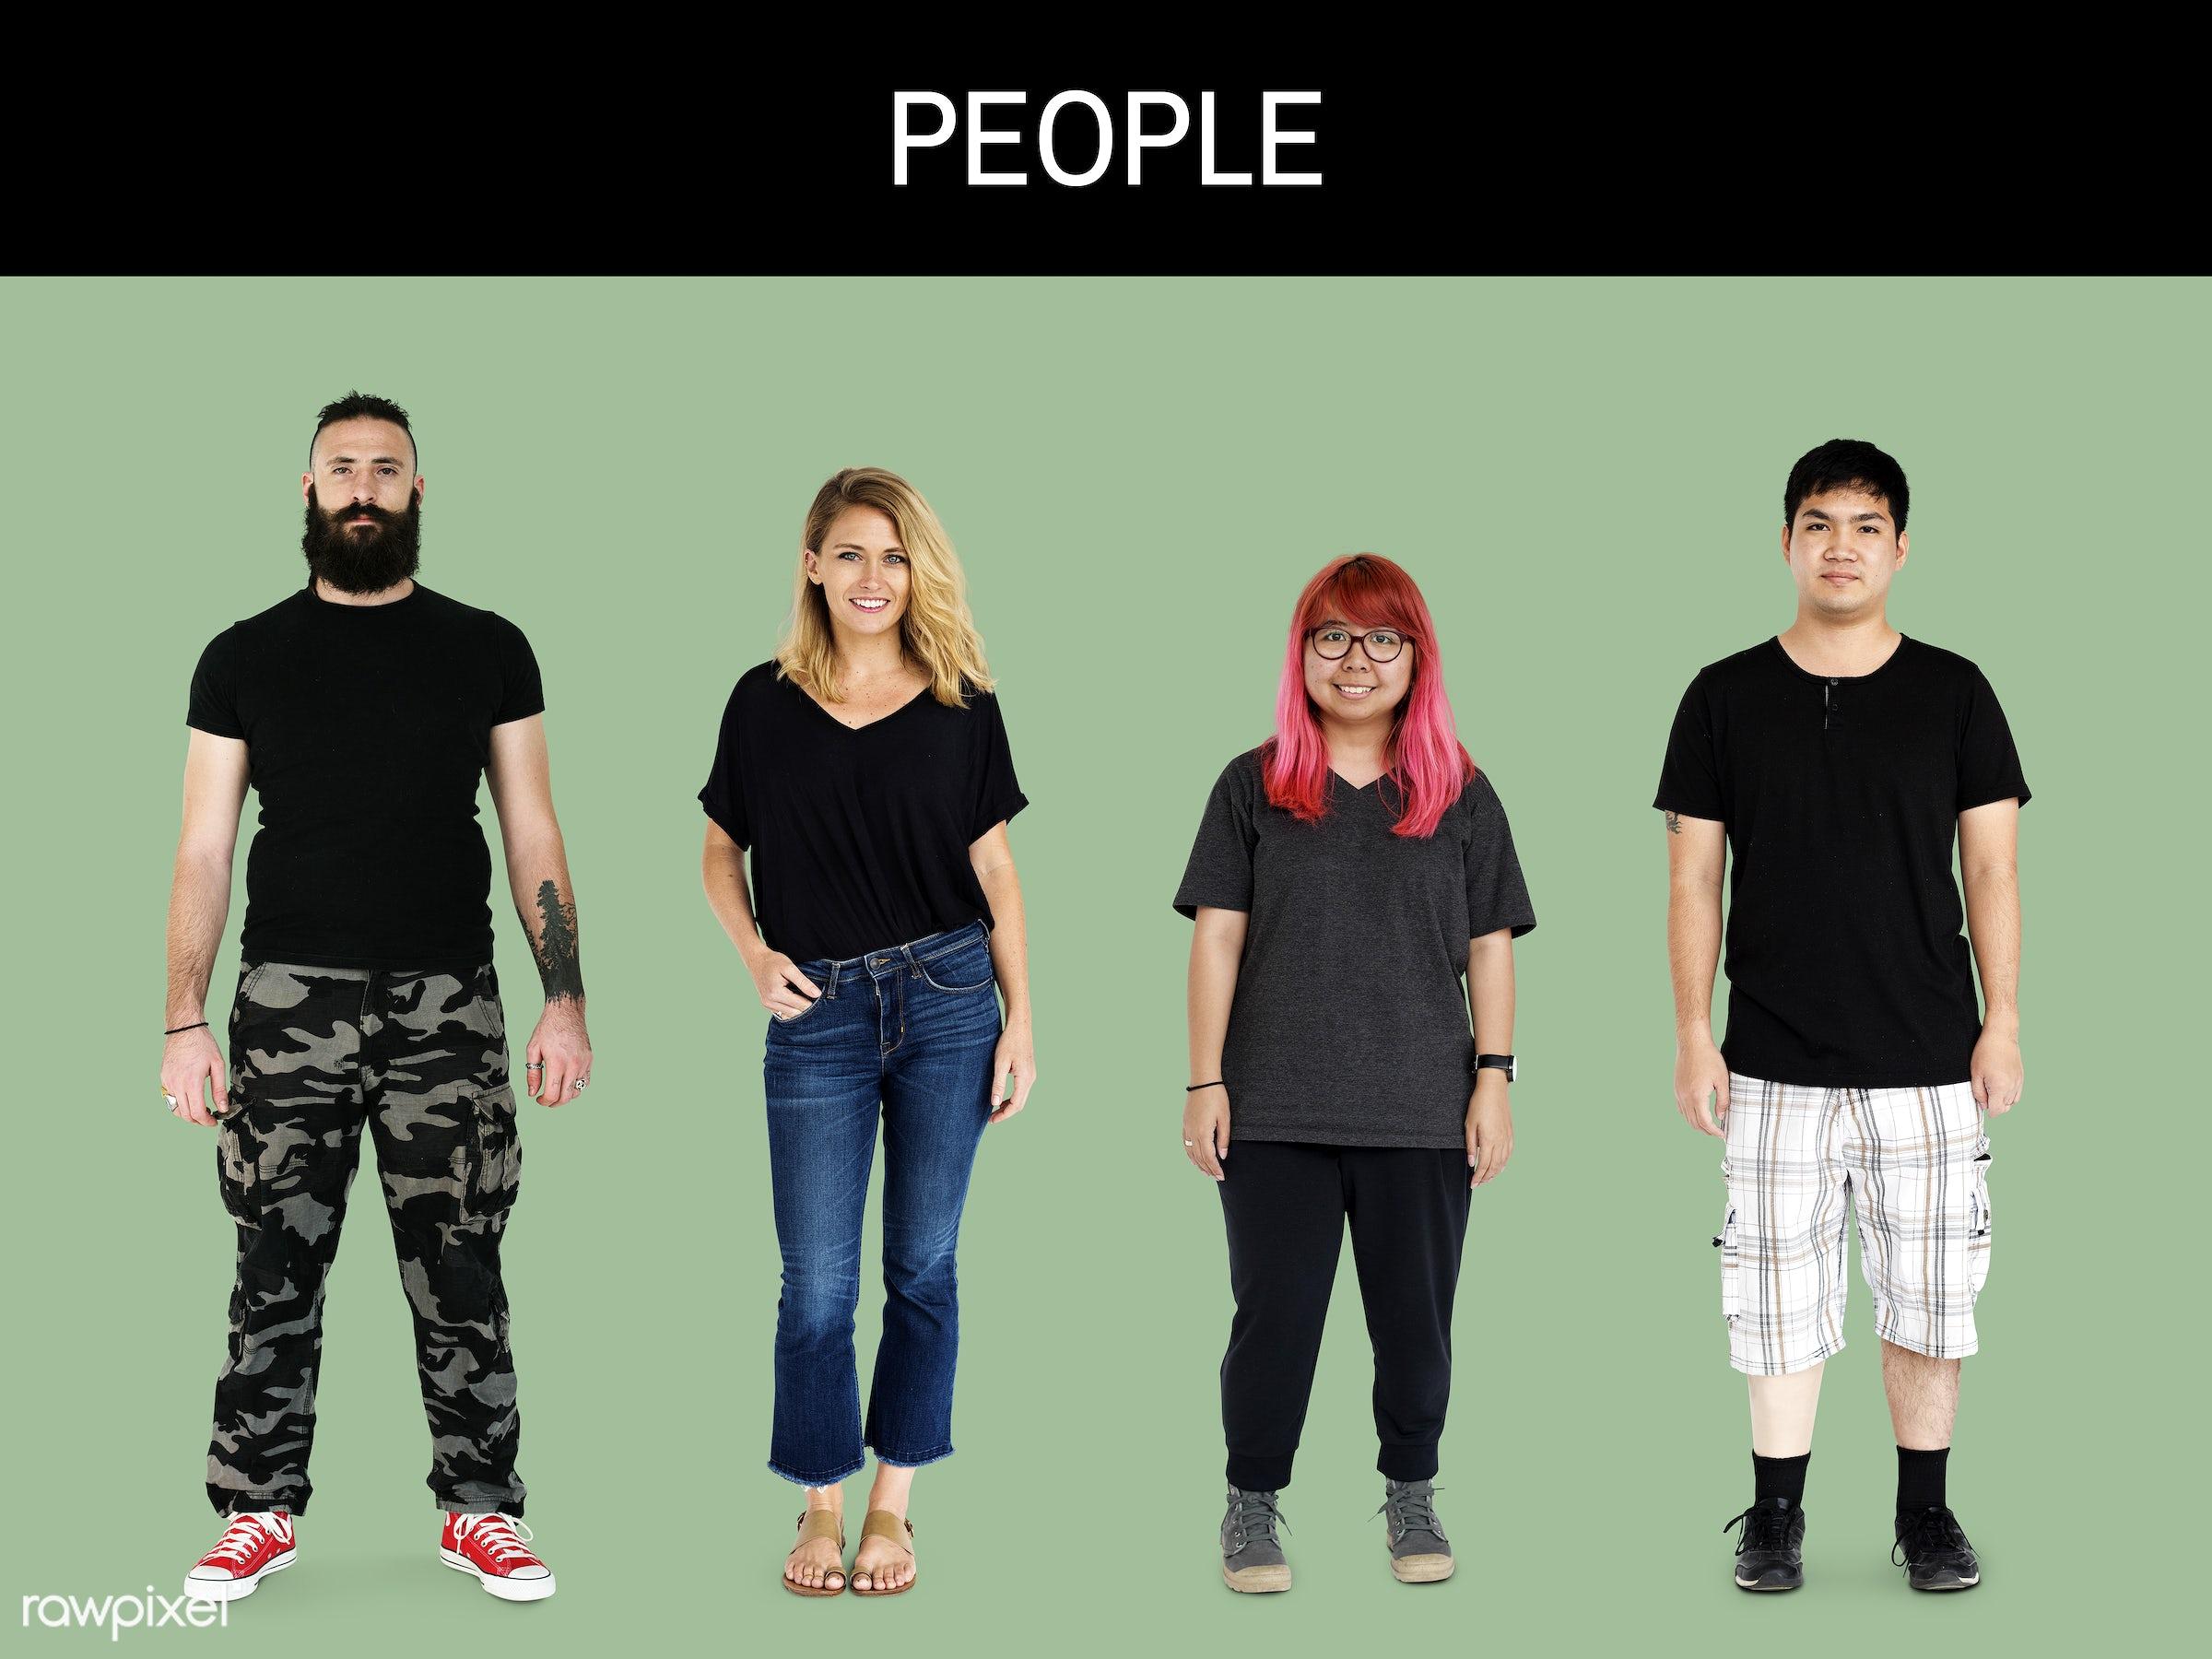 gentlemen, studio, person, diverse, set, tee, people, attraction, together, caucasian, asian, black shirt, life, woman,...